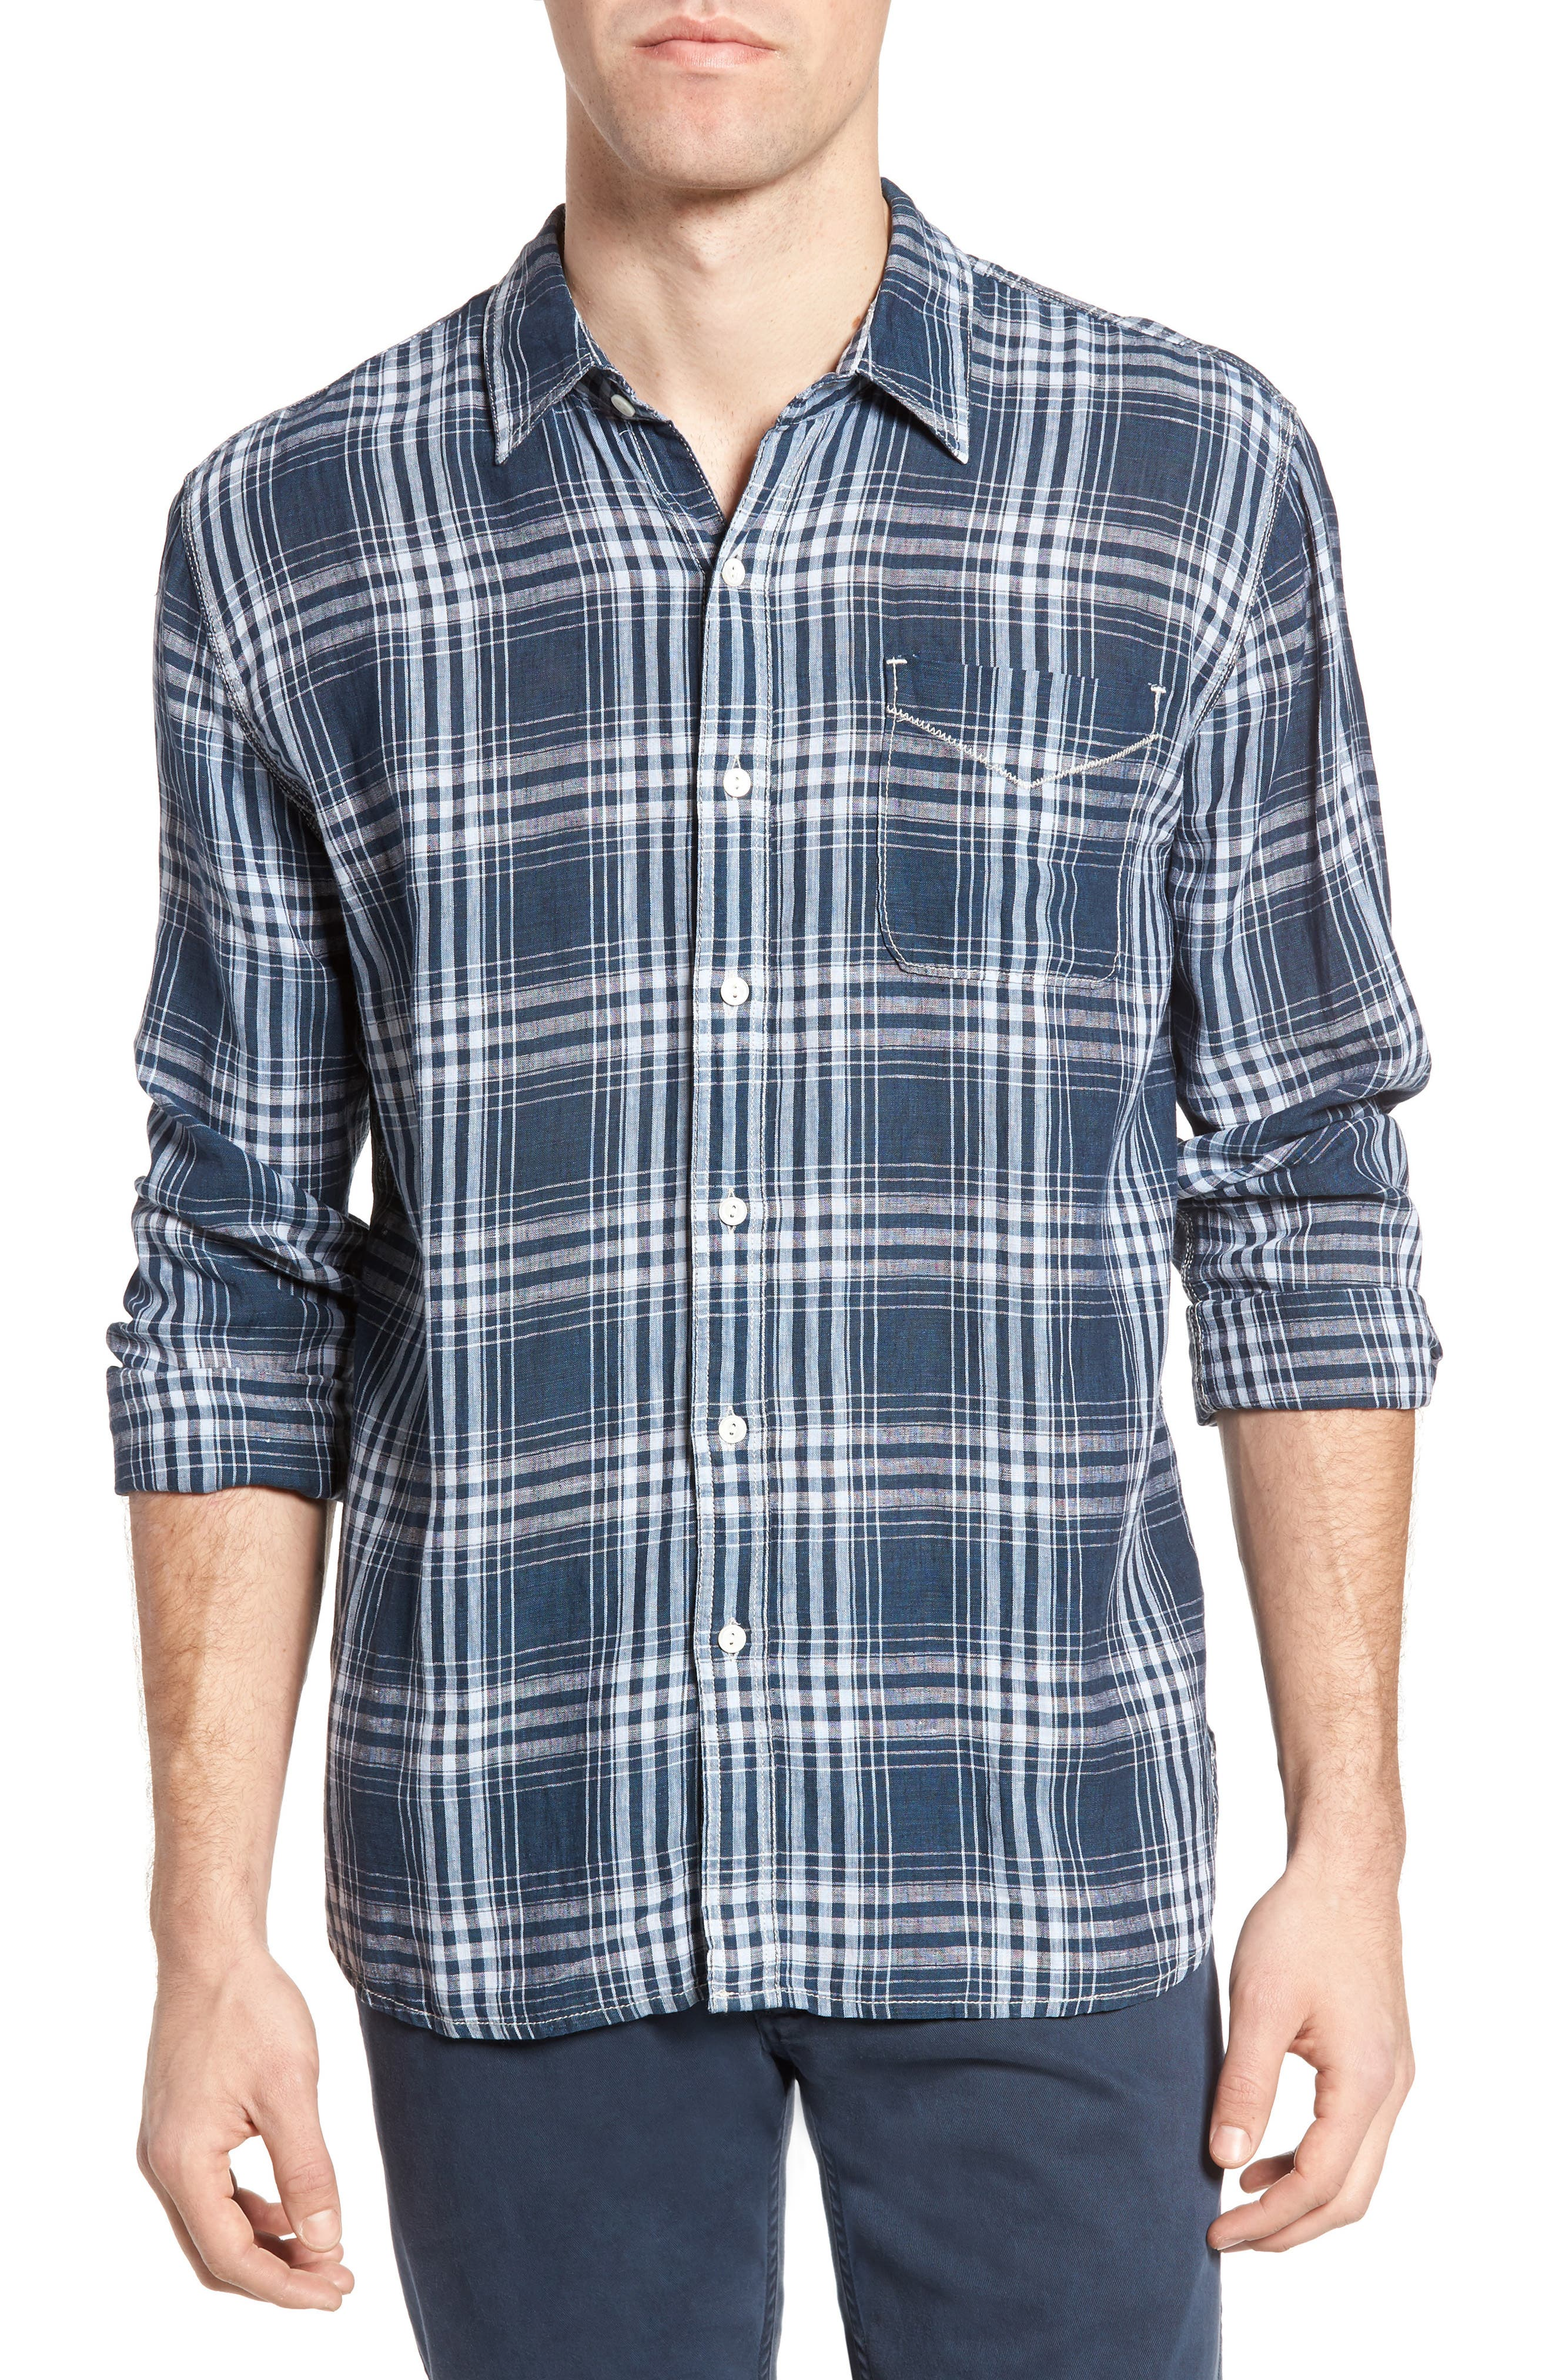 Alternate Image 1 Selected - True Grit Indigo Plaid Sport Shirt